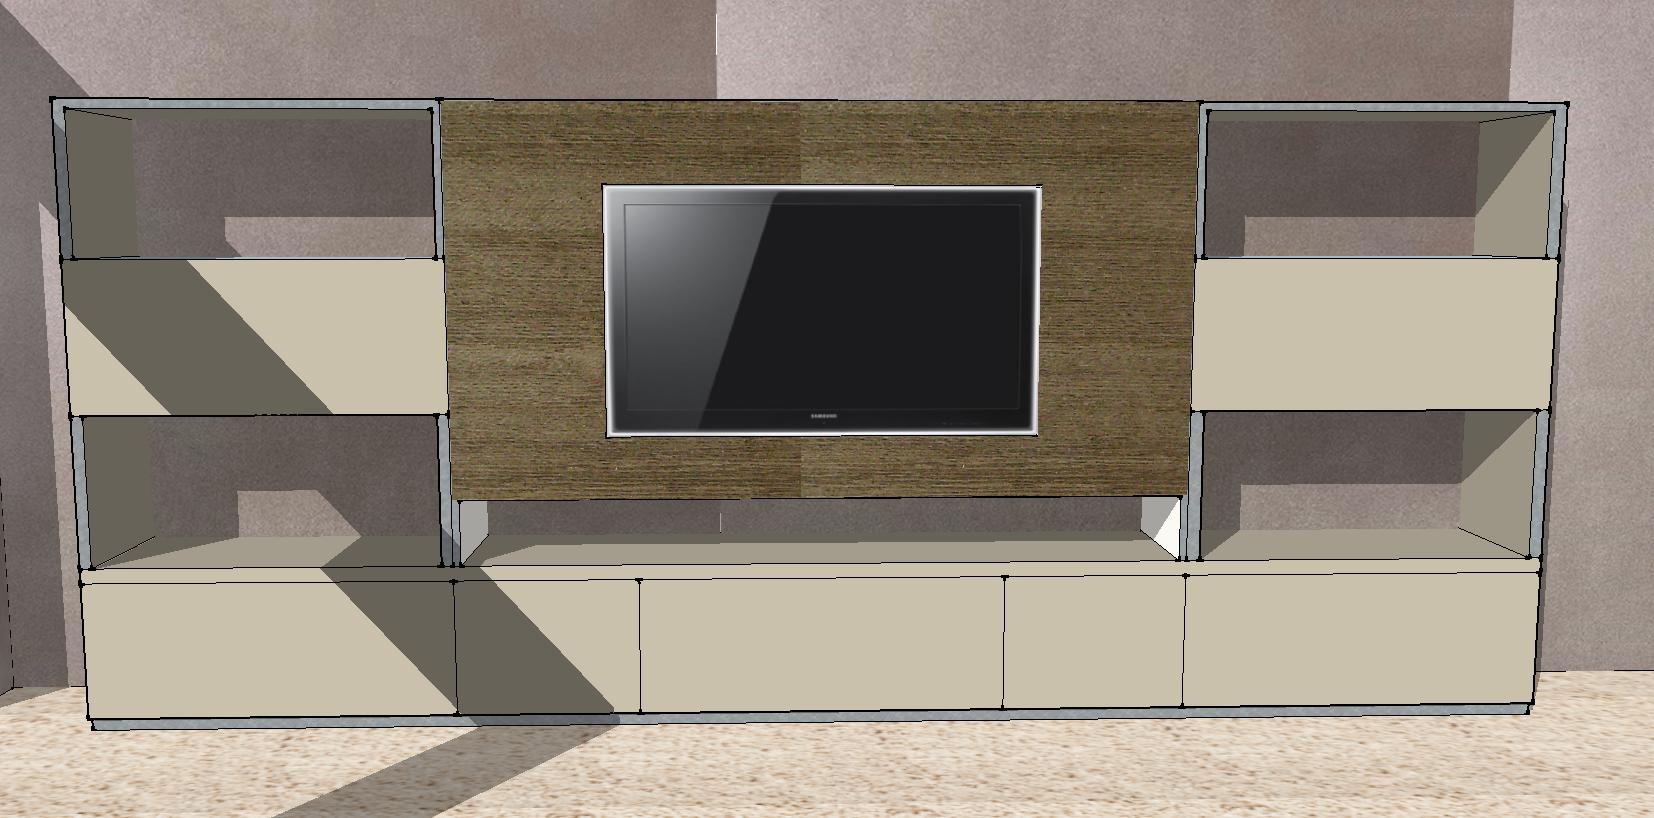 Sketchup Plan For Large Custom Made Tv Unit Part Specialist  # Muebles Google Sketchup